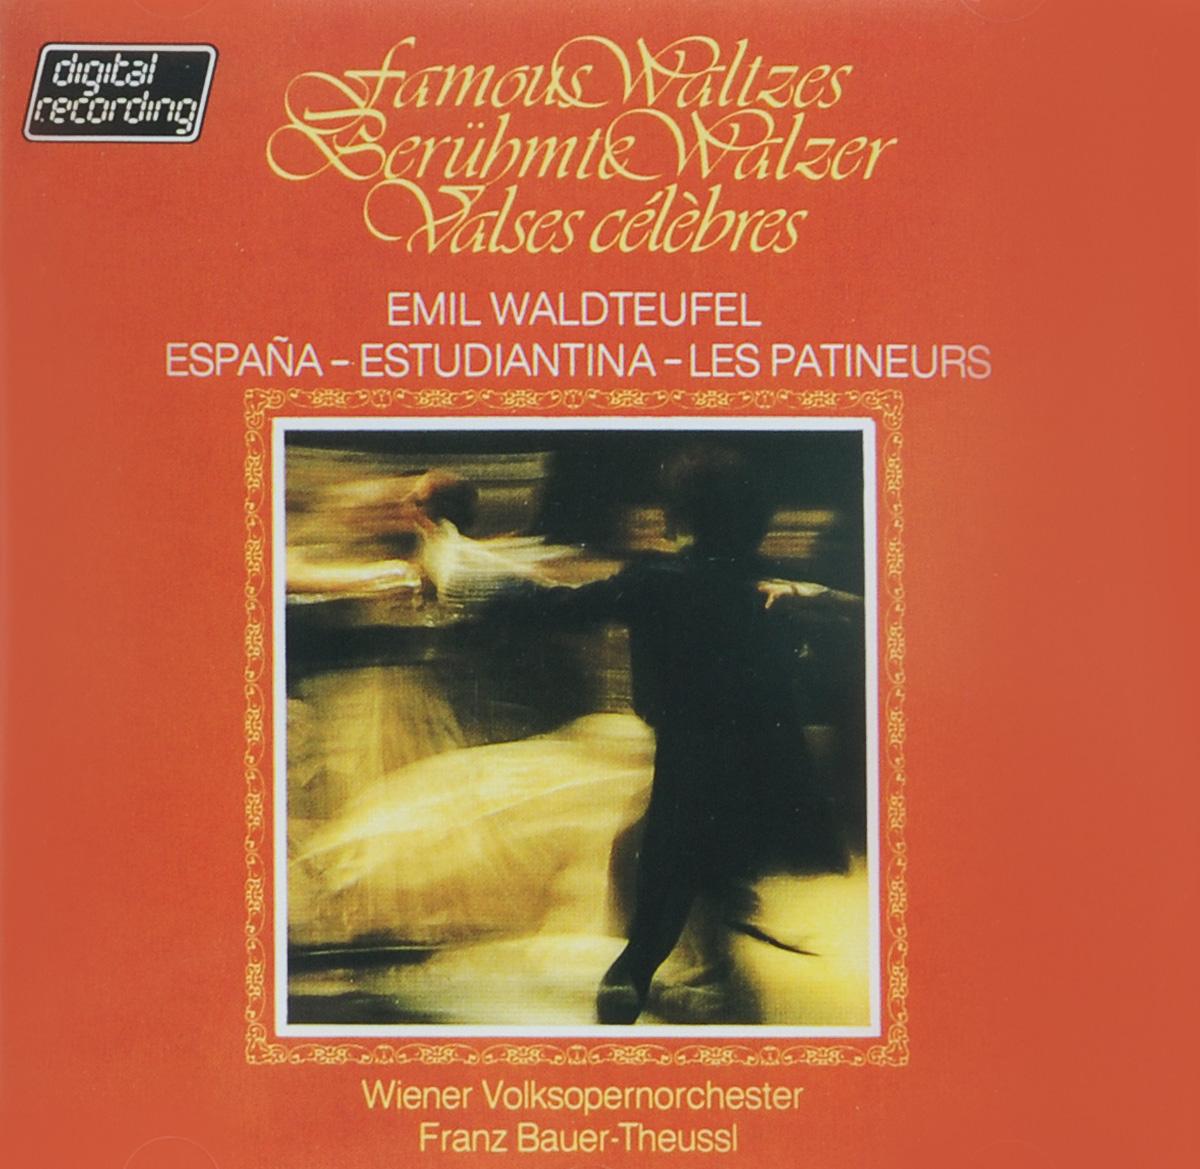 Франц Бауер-Тойссл,Wiener Volksopernorchester Franz Bauer-Theussl. Waldteufel. Famous Waltzes франц бдоян franz bdoyan roots of armenian jazz